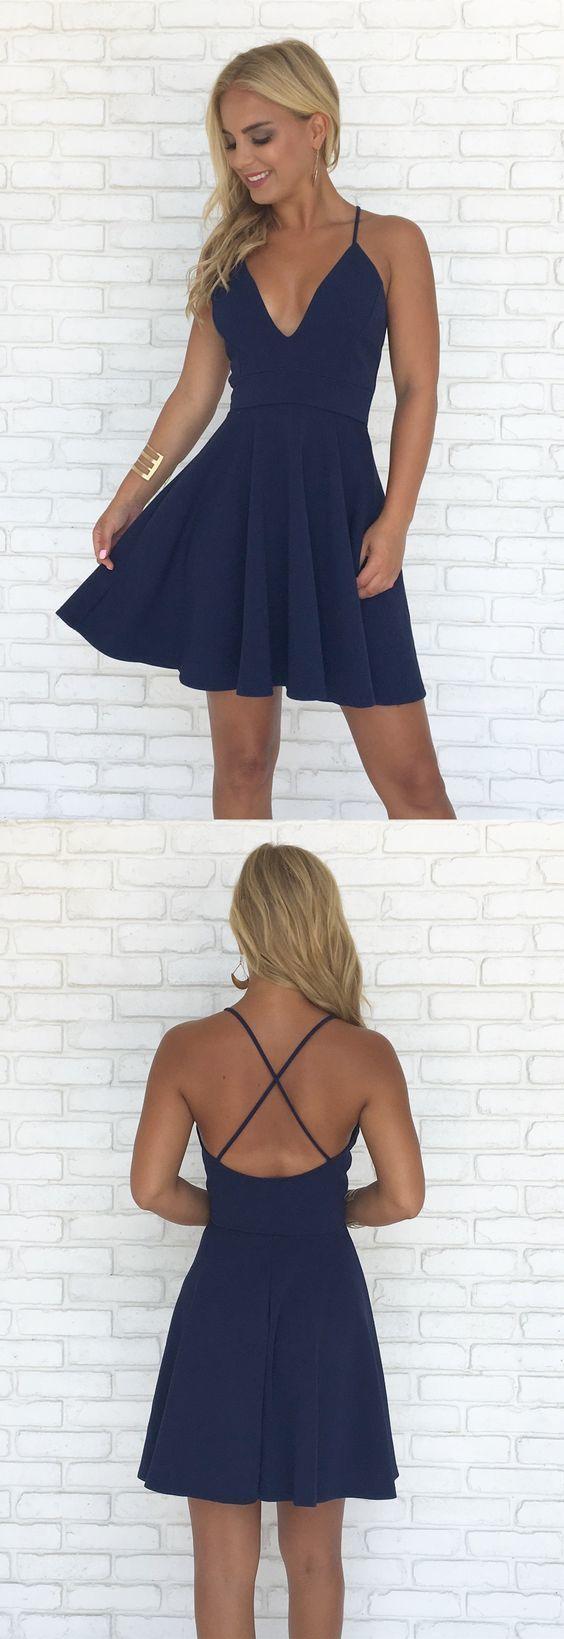 Short prom dress aline homecoming dress v neck party dress navy